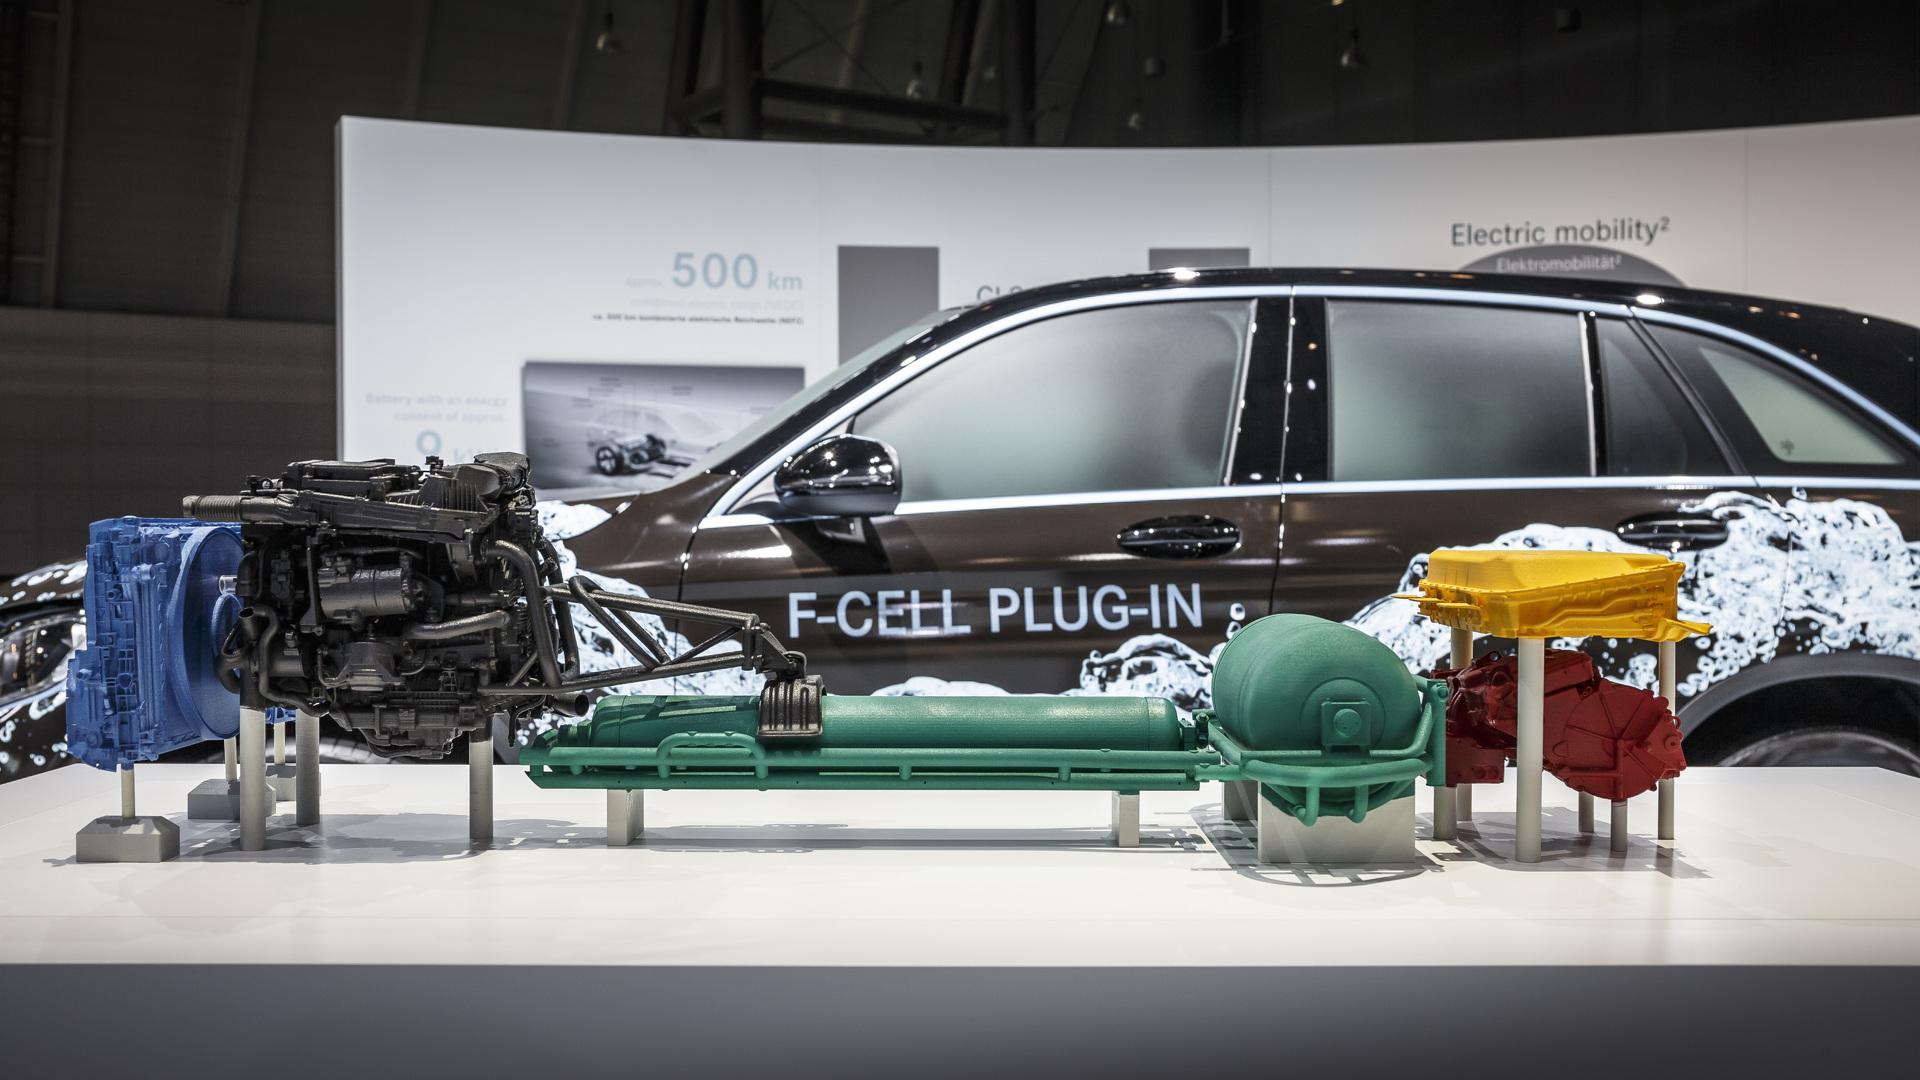 Photo of Στοπ η Daimler στα fuel-cell για χάρη των EV, η Toyota βλέπει ατμόσφαιρα και φουλ υβριδικά [blog]